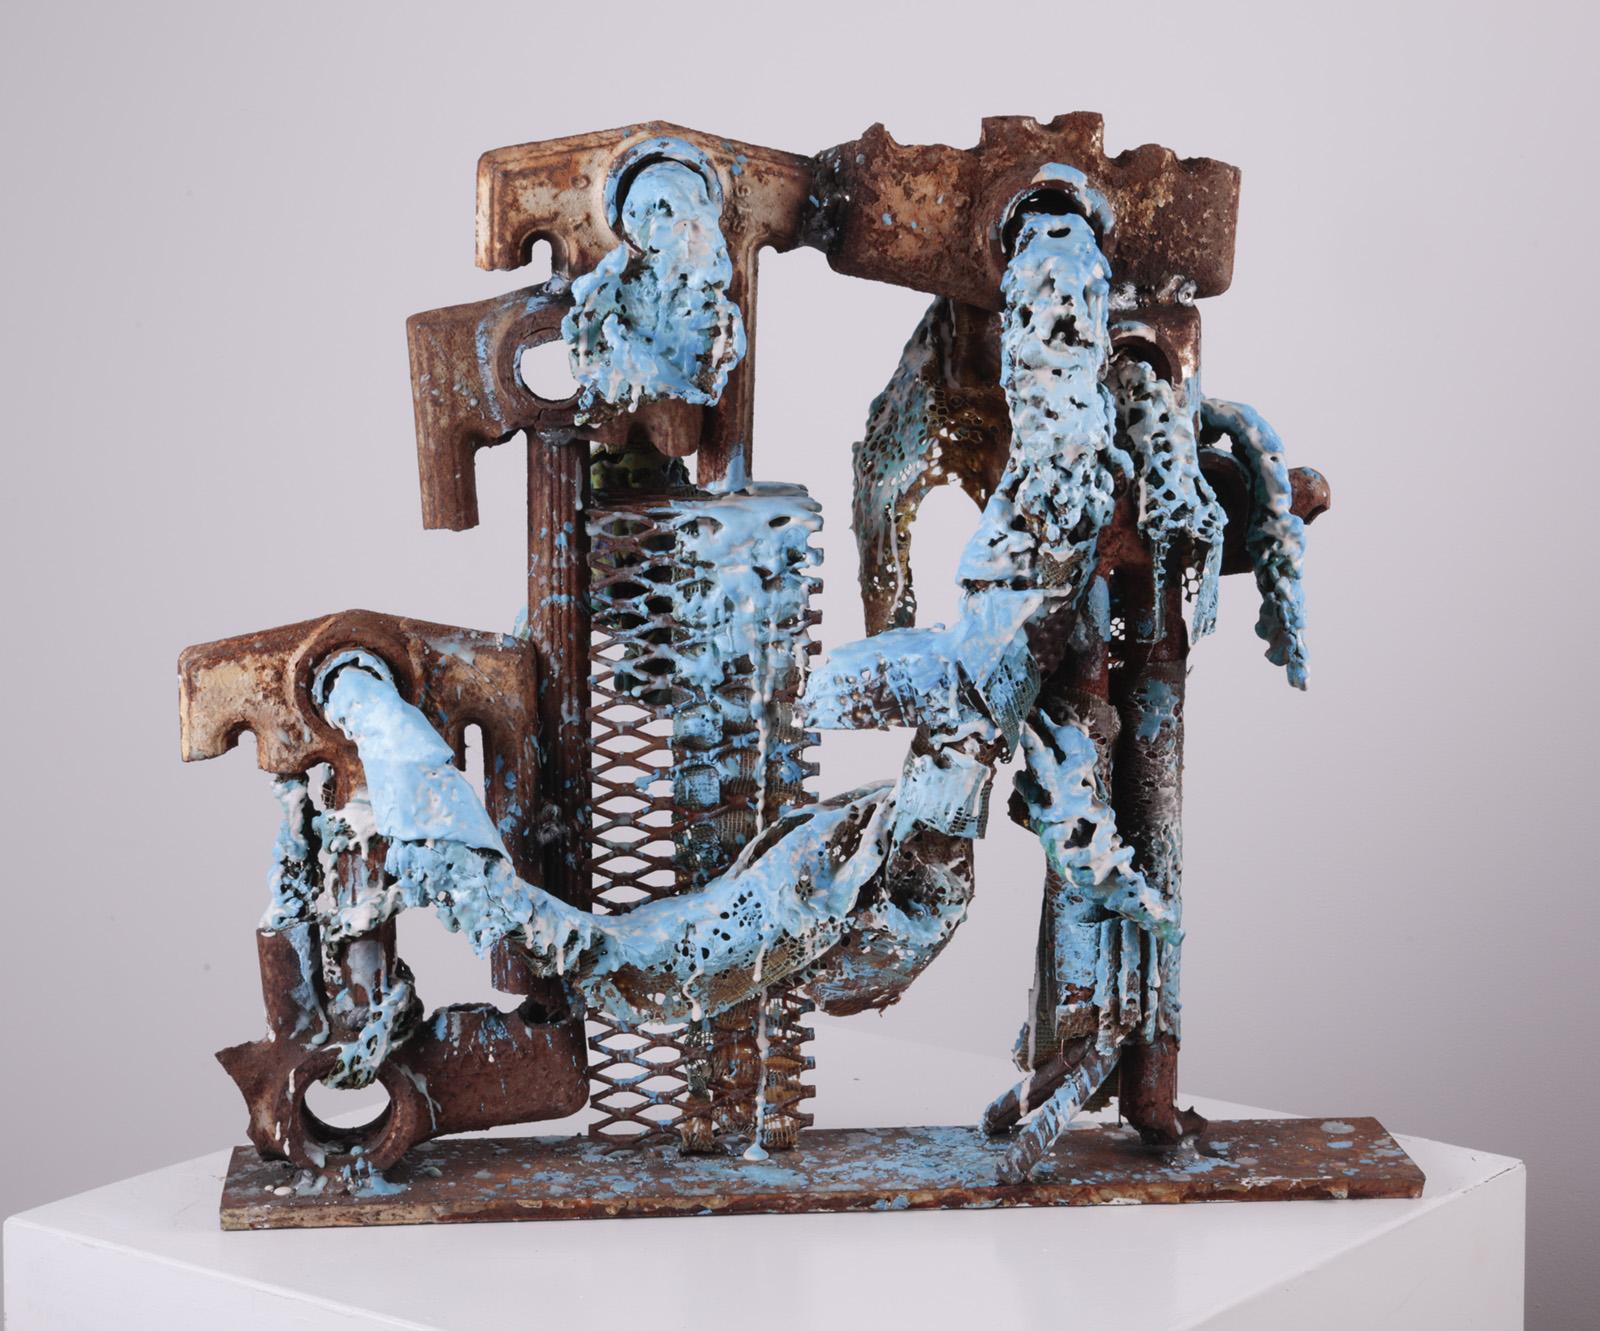 Darlington_Wastewater_Sculpture1.jpeg